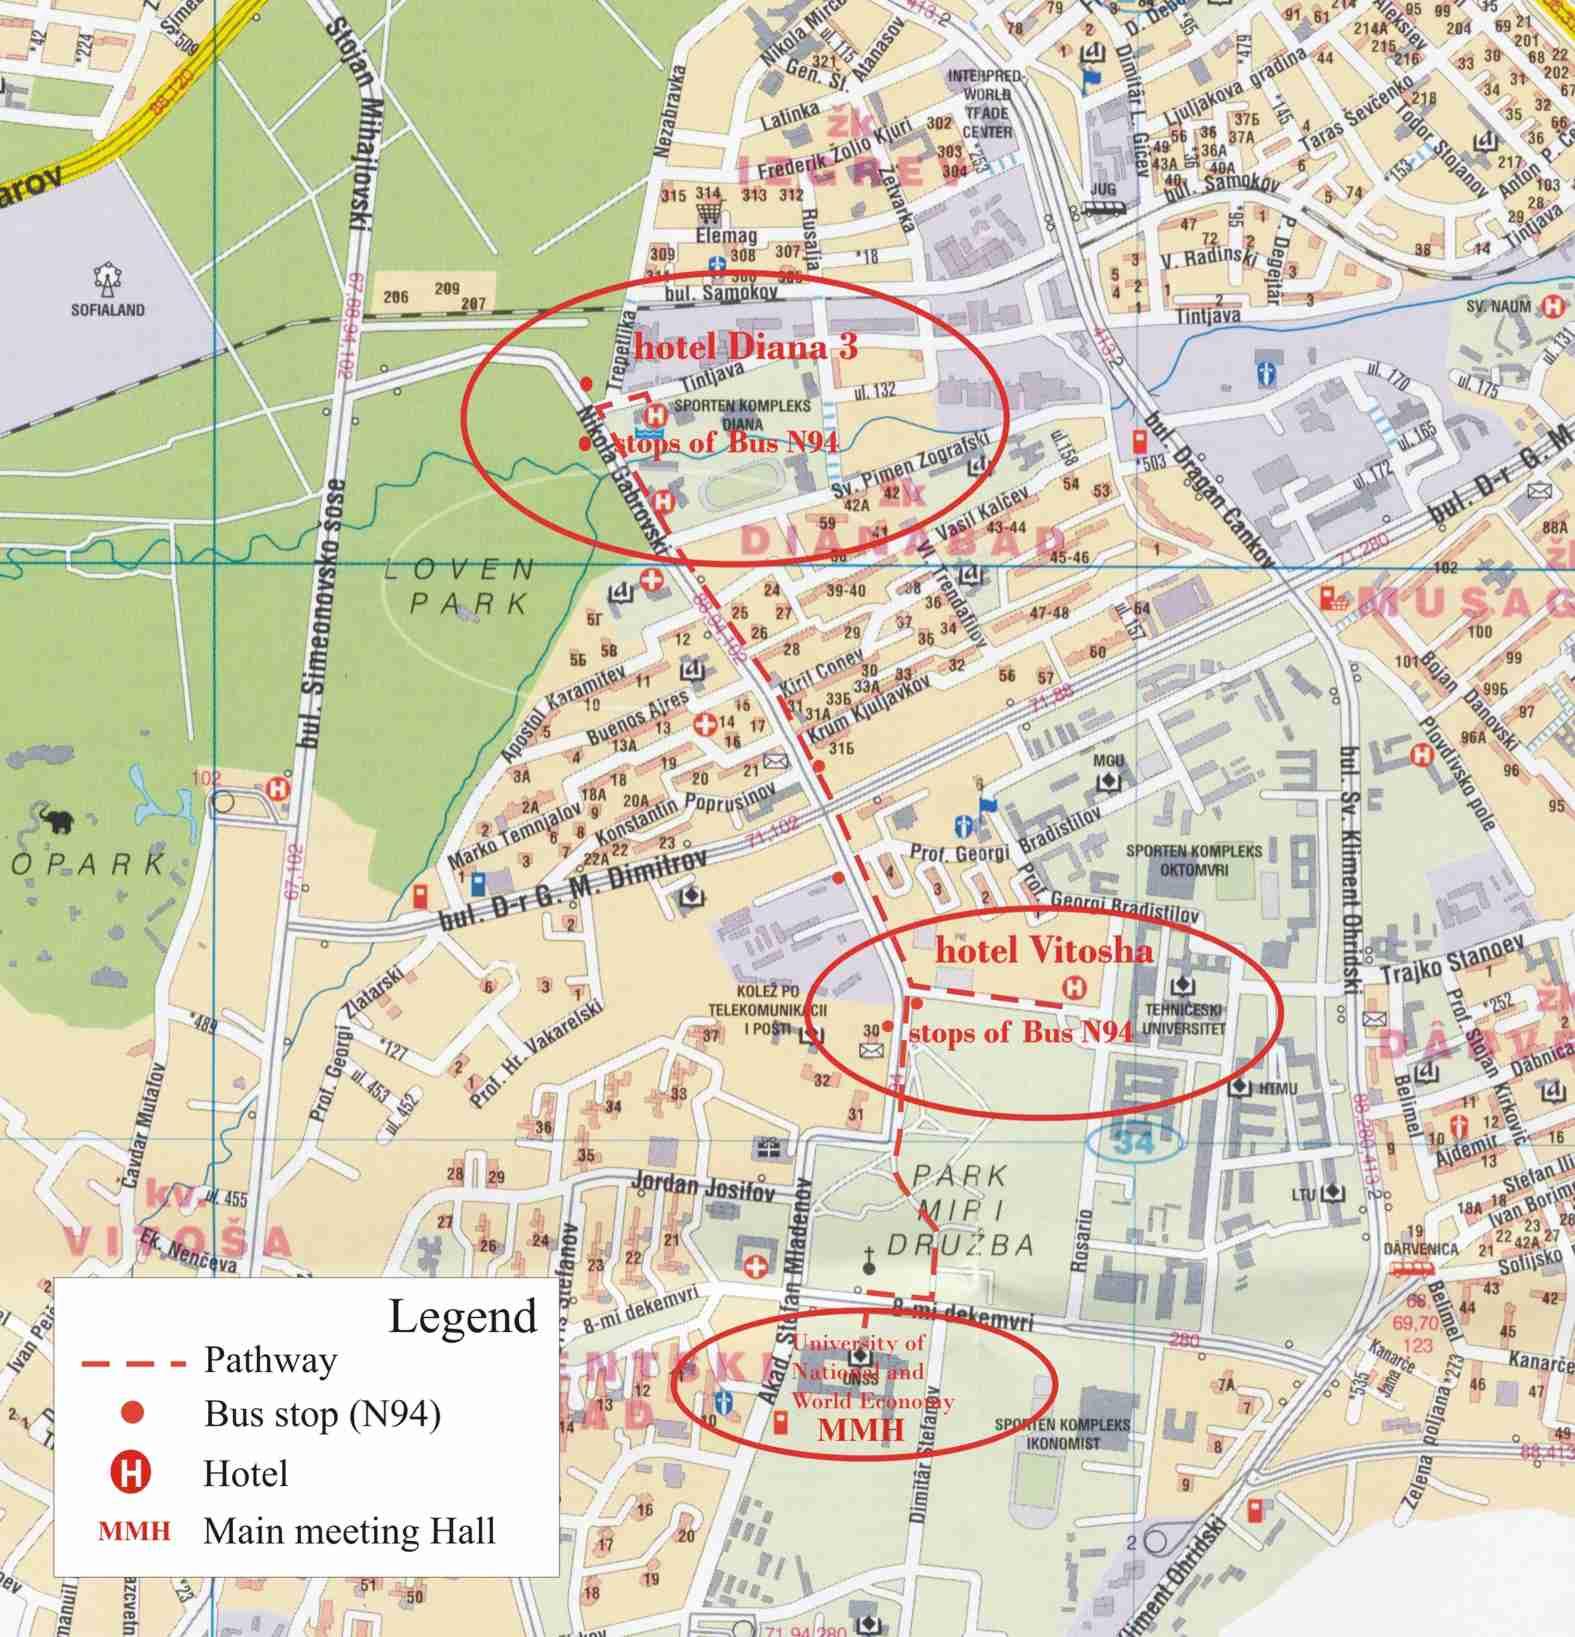 map park bio skanderborg